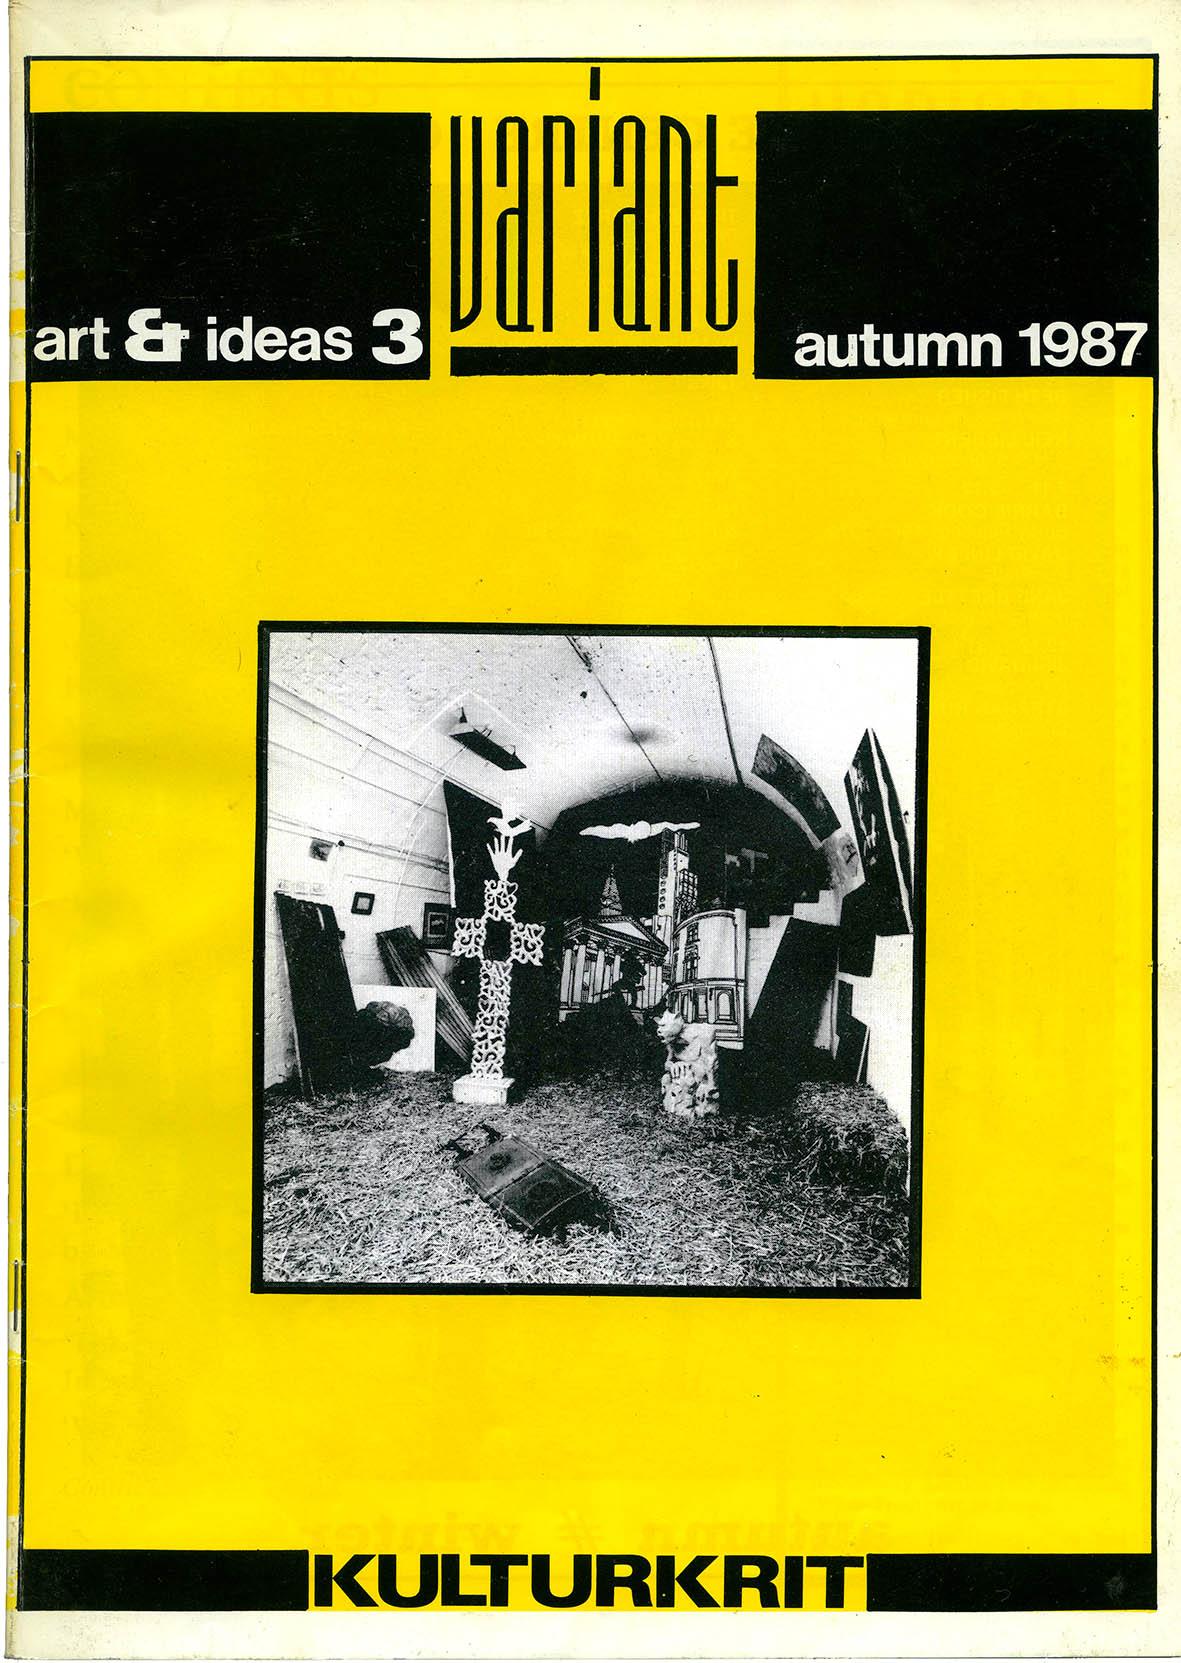 Variant Cover: Autumn 1987